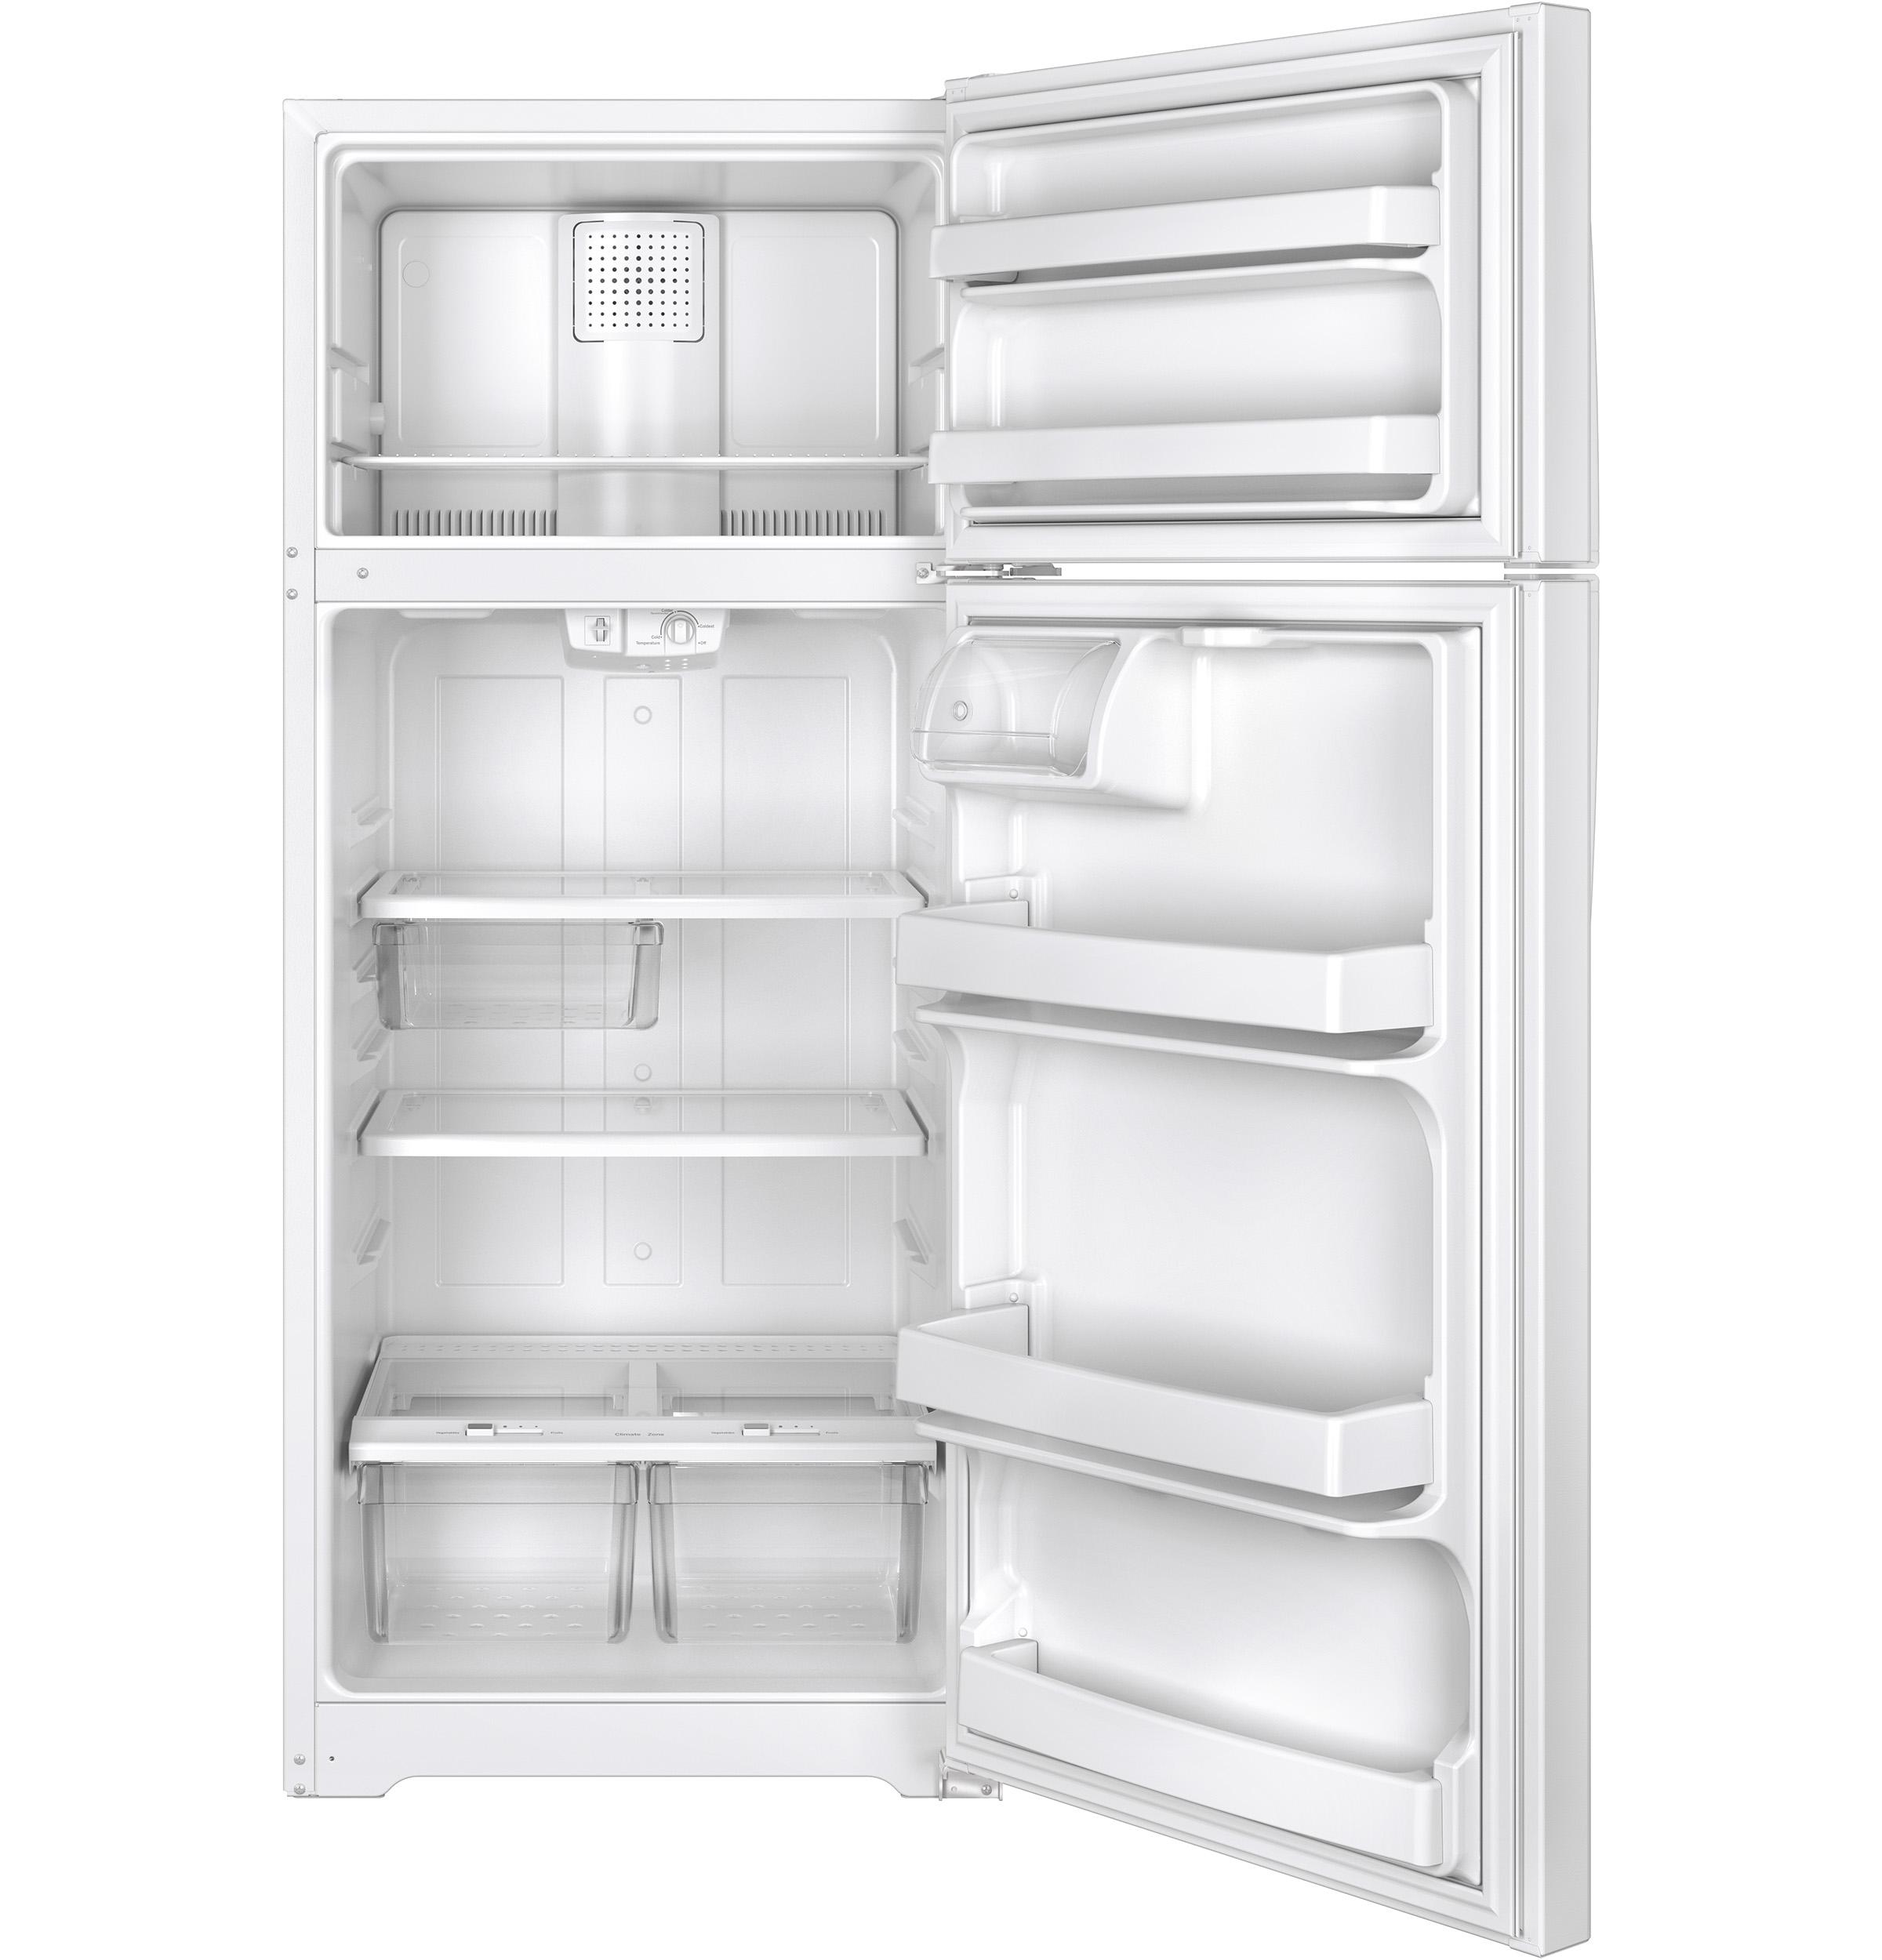 Model: GTS18GTHWW | GE GE® 17.5 Cu. Ft. Top-Freezer Refrigerator